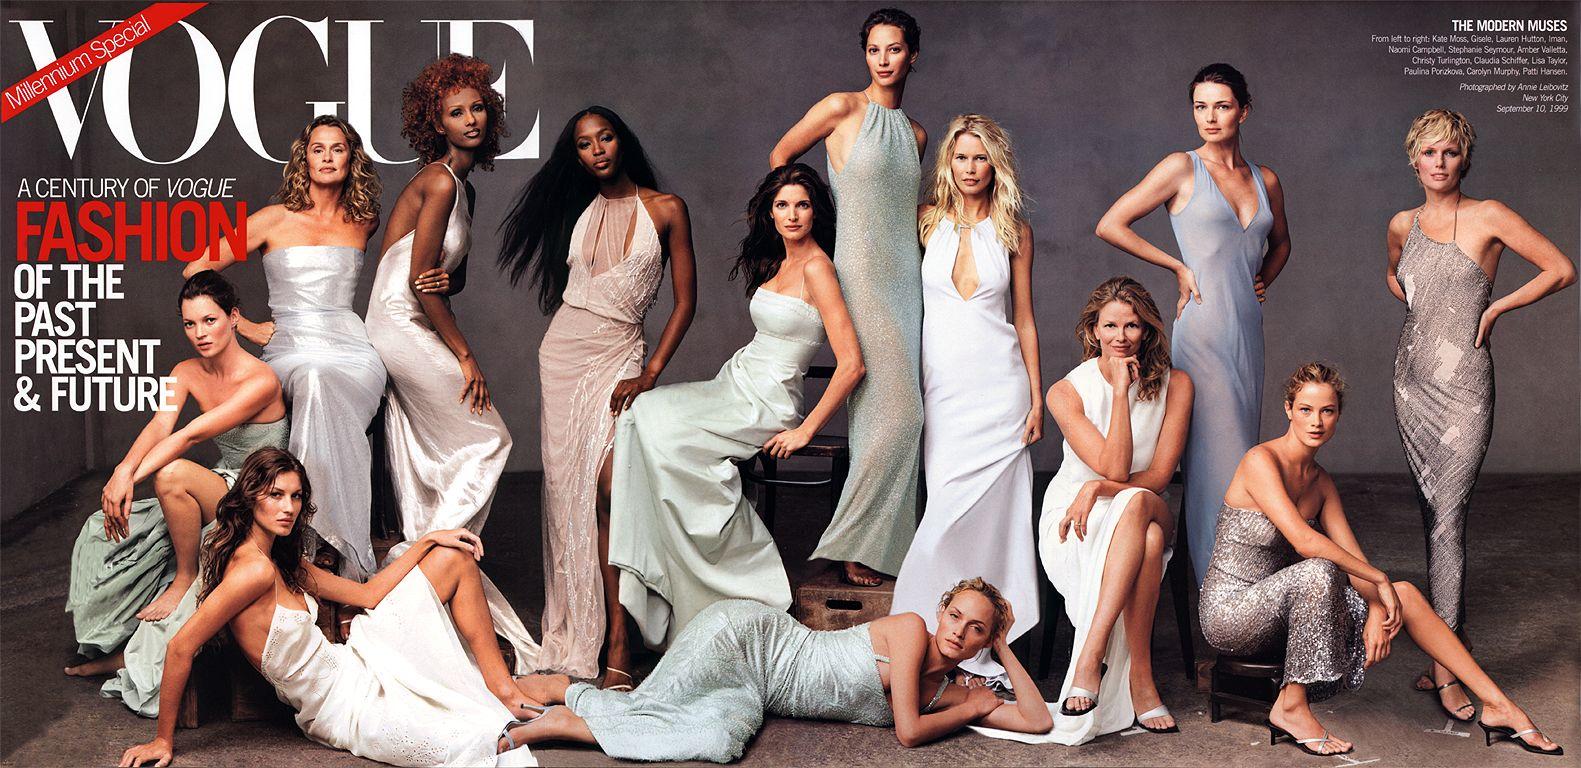 http://3.bp.blogspot.com/-JoWJUPOAmno/TjWOT_jKp_I/AAAAAAAADSQ/tDhE6Y2em_Y/s1600/vogue-usa-1999-november-00++Amber+Valletta+Carolyn+Murphy+Christy+Turlington+Claudia+Schiffer+Gisele+Bundchen+Kate+Moss+Naomi+Campbell+Paulina+Porizkova+Stephanie+Seymour+Lisa+Taylor+Chanel+Iman.jpg